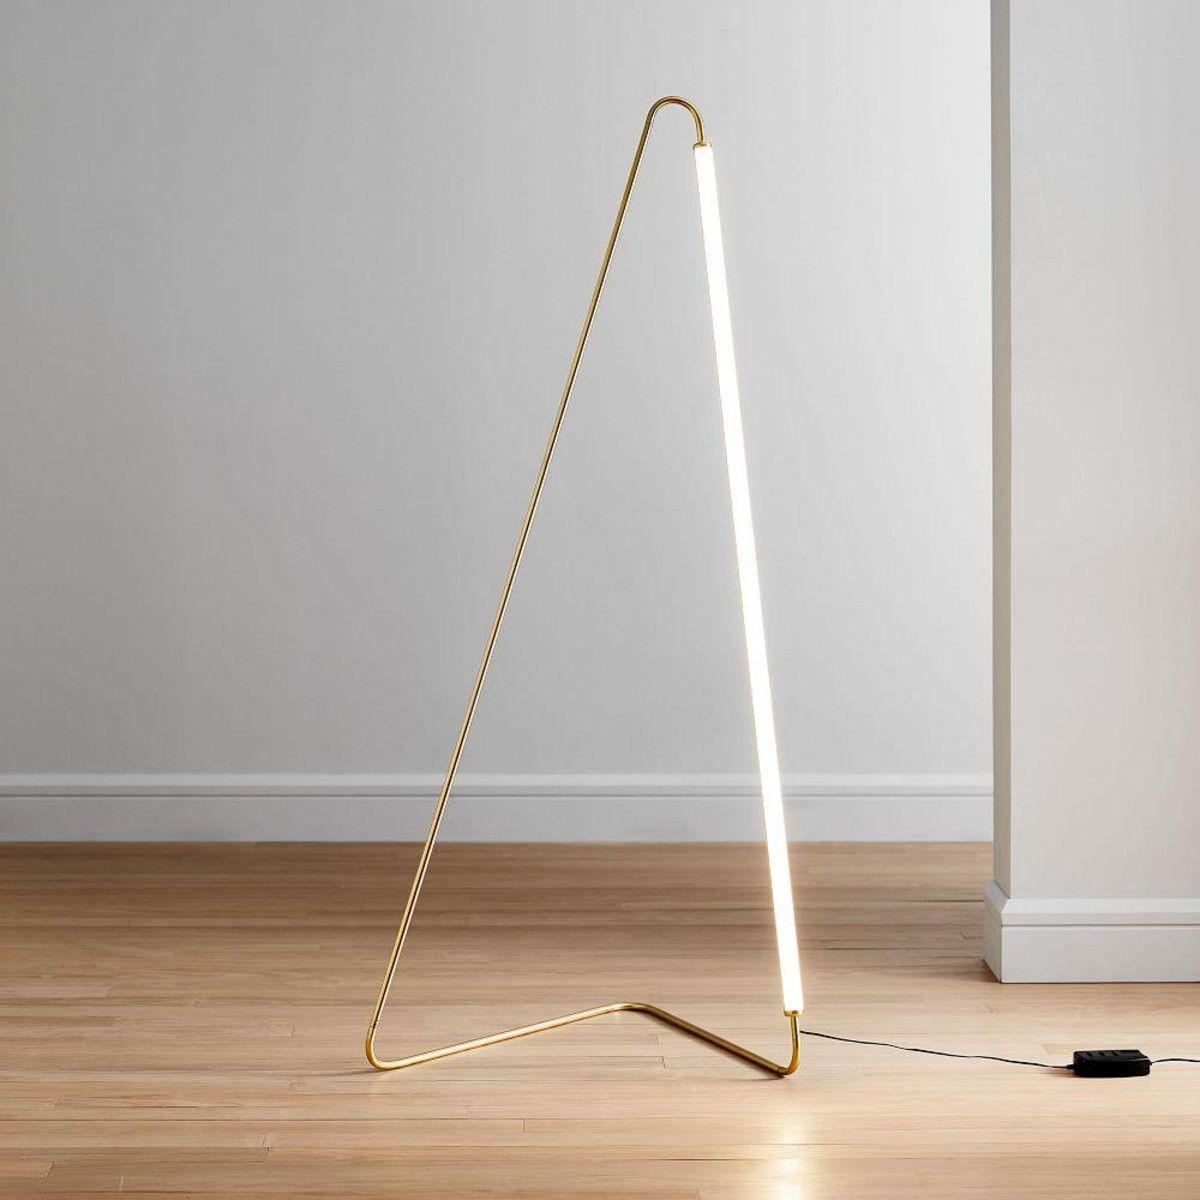 Line Art Floor Lamp West Elm Uk Led Floor Lamp Floor Lamp Line Art